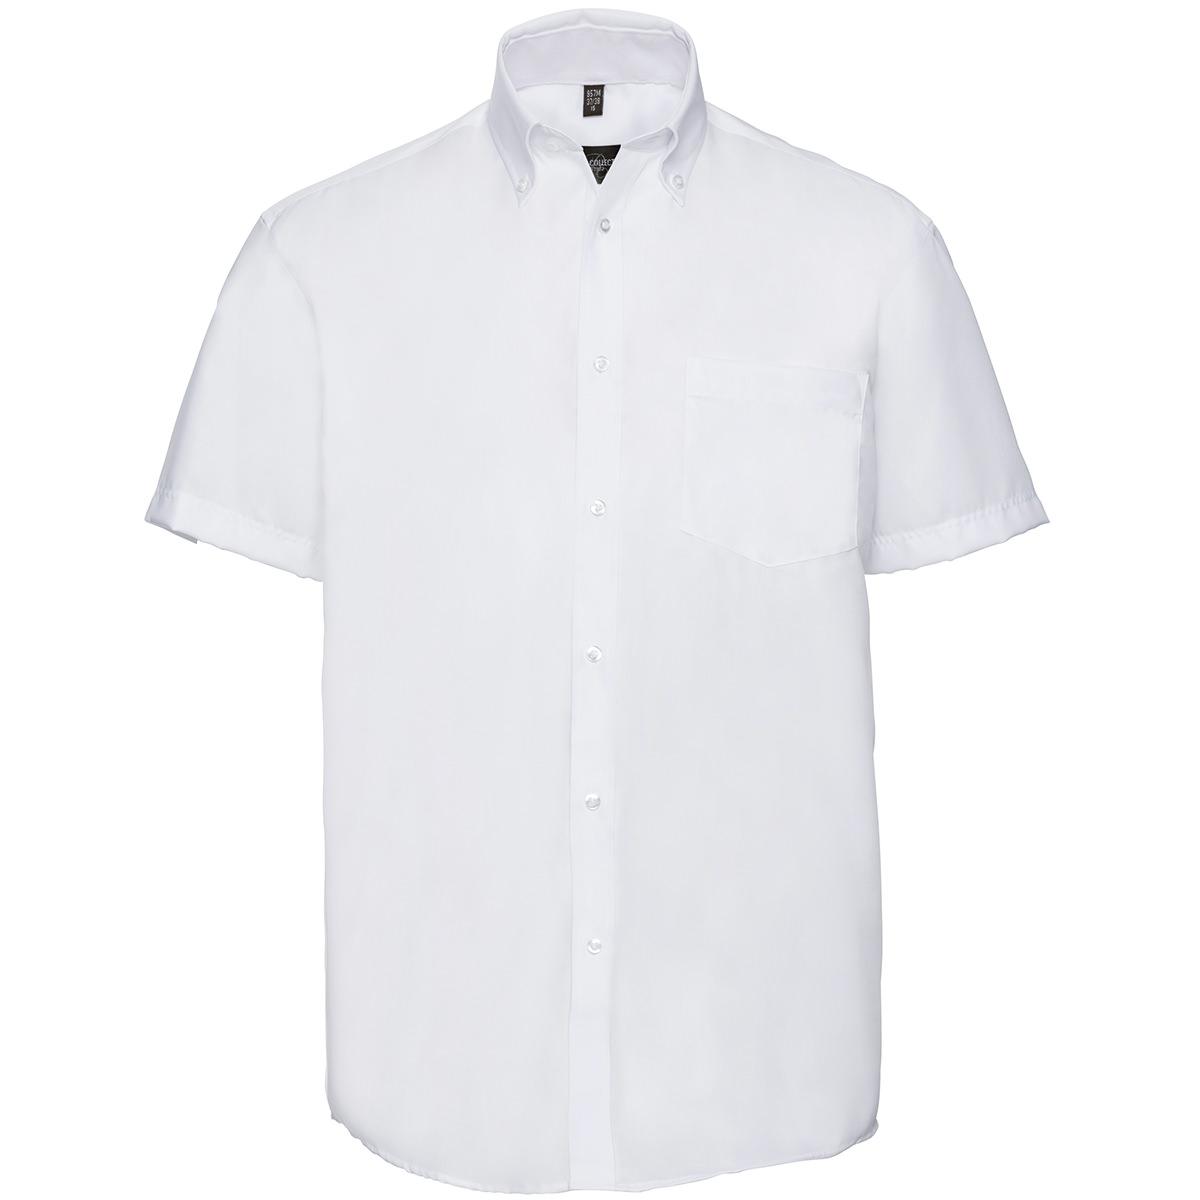 Klassisches bügelfreies Hemd - Kurzarm